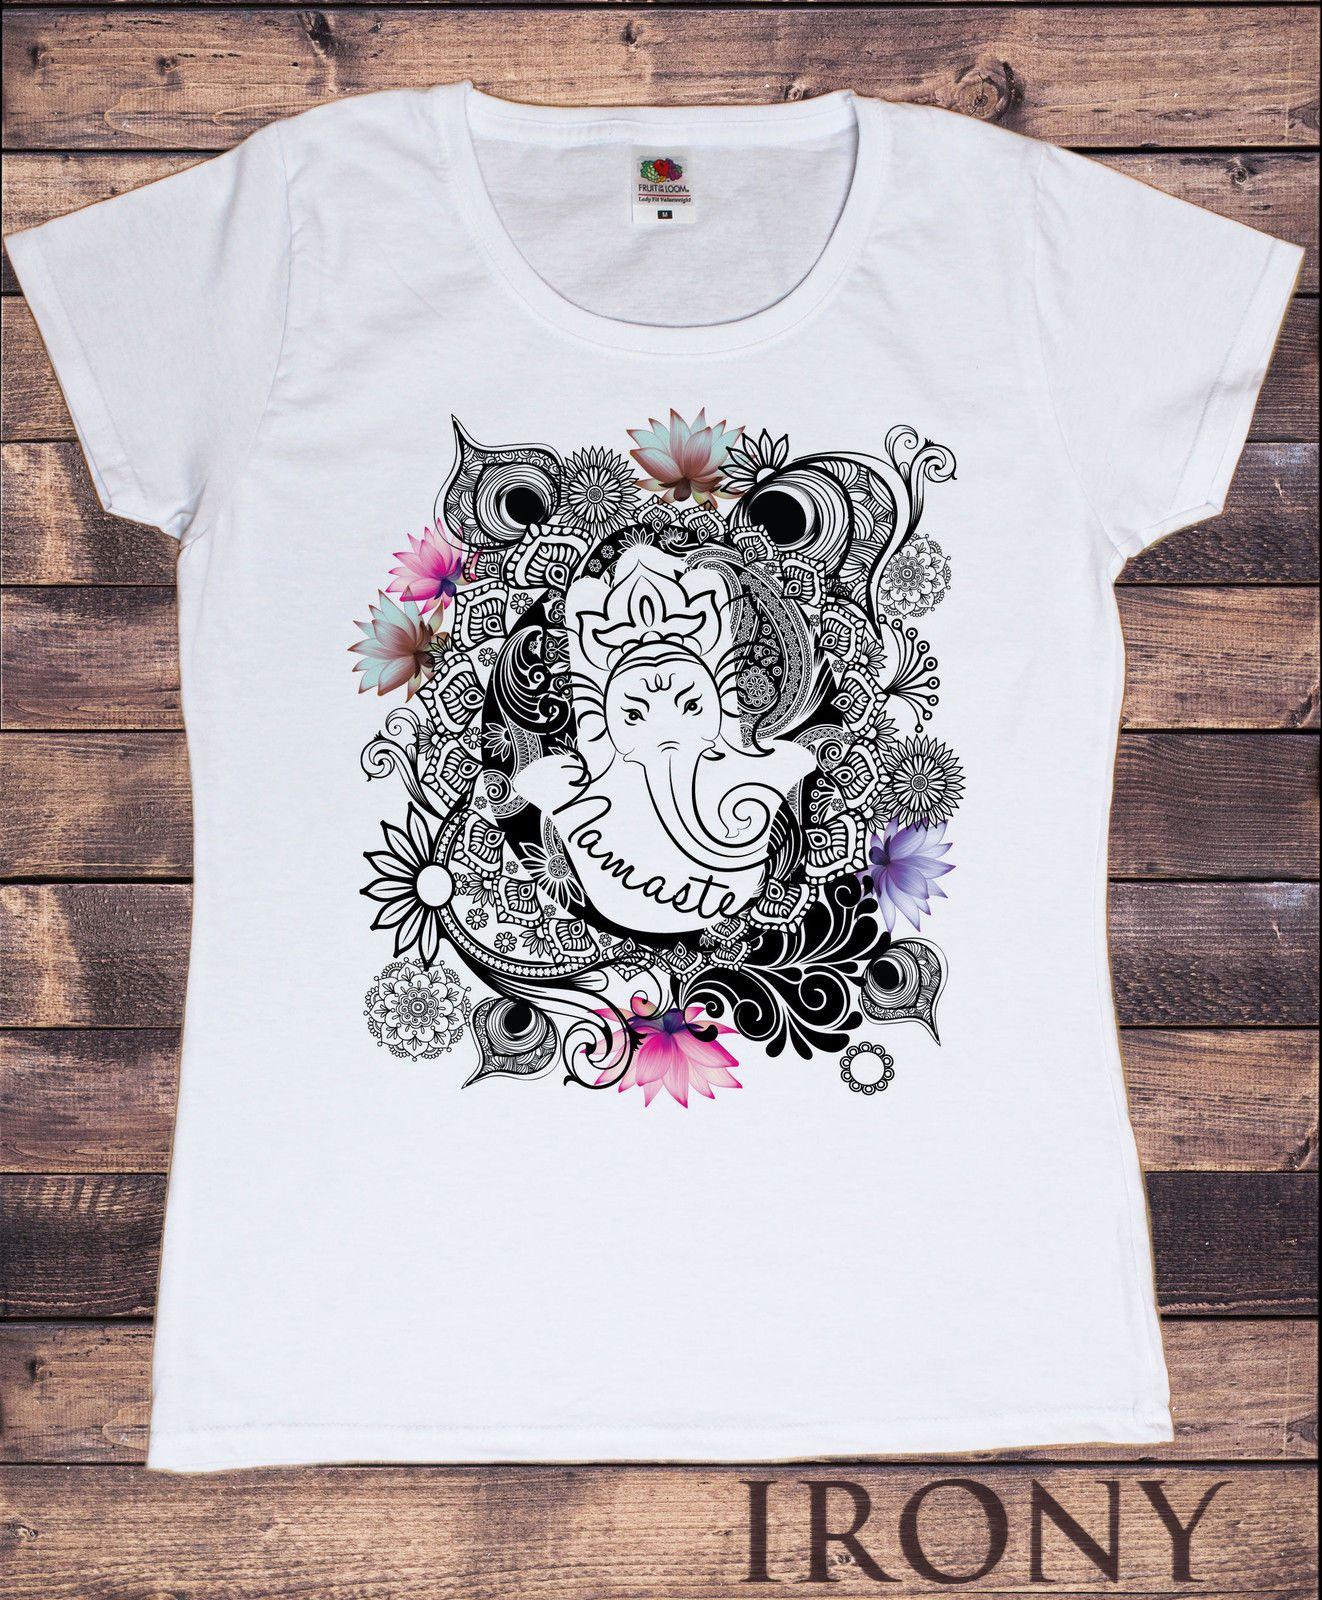 729f38444b Women'S T Shirt Namaste Ganesh Lotus Flowers Yoga Meditation Zen Print  TS150 Men Women Unisex Fashion Tshirt Ti Shirt Best T Shirt Sites From ...